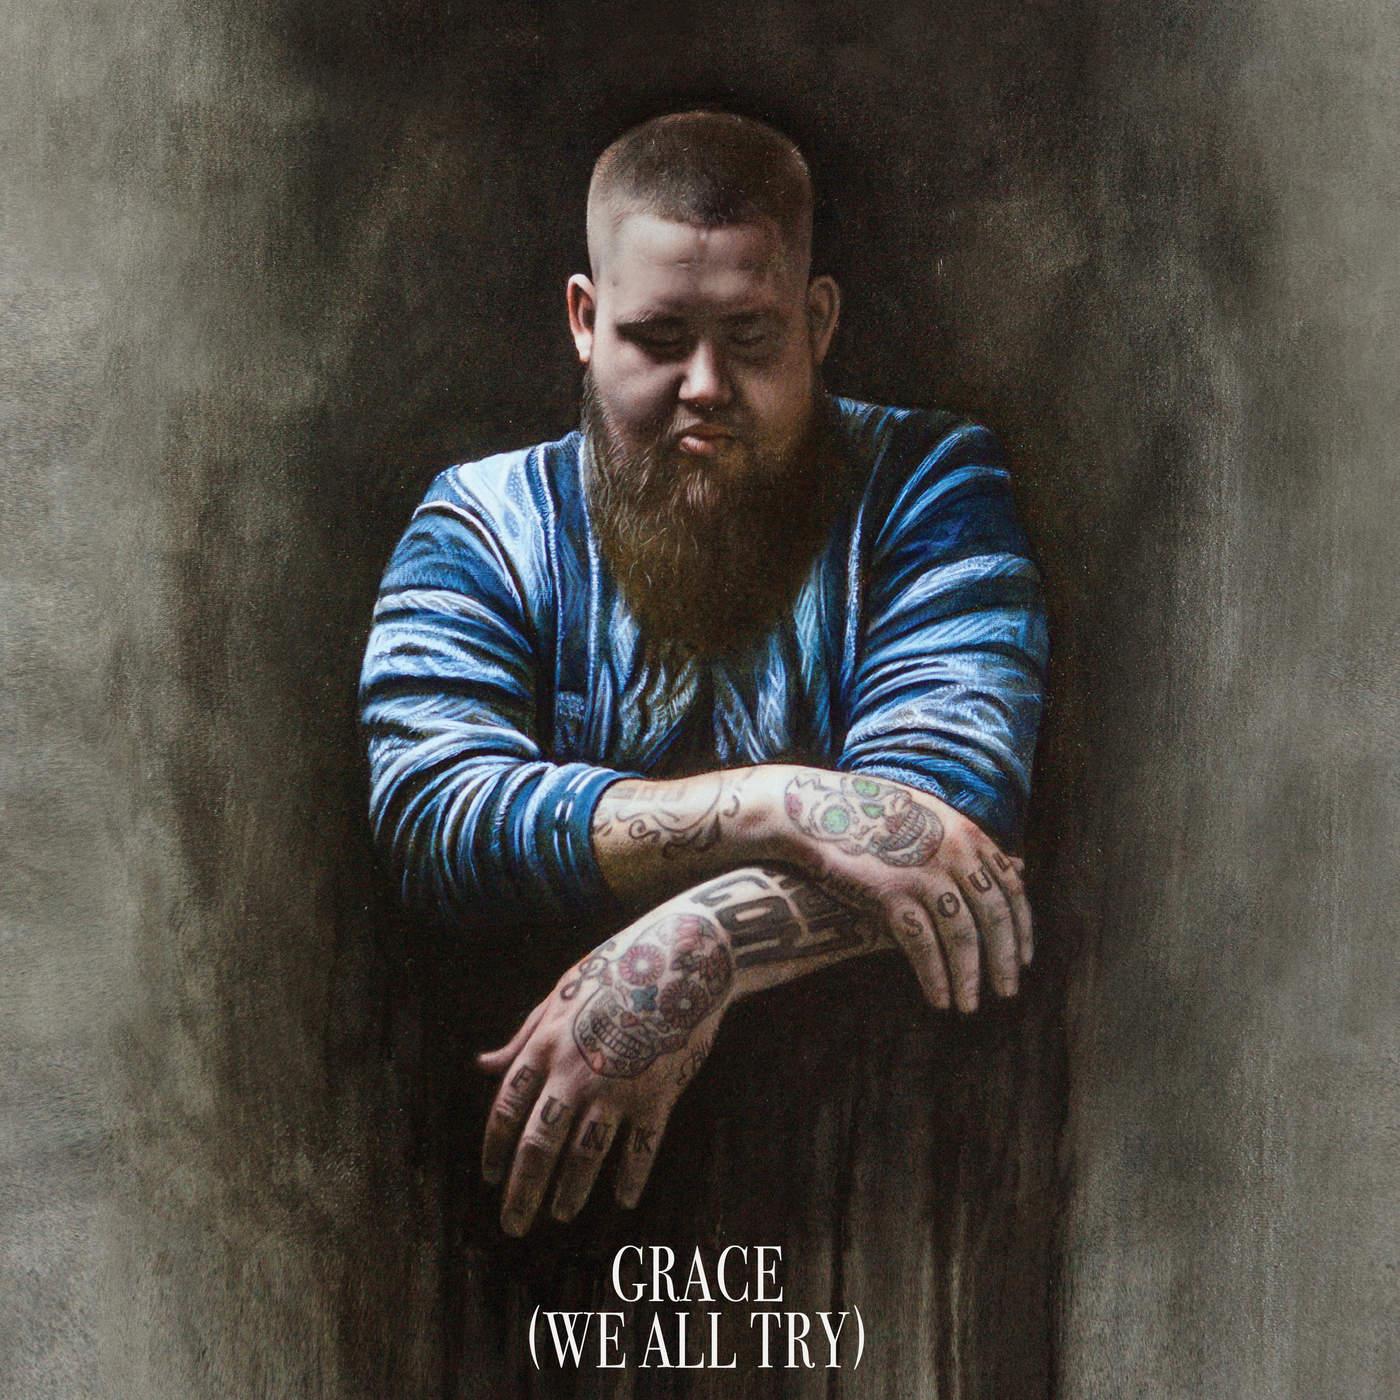 Rag'n'Bone Man - Grace (We All Try) - Single